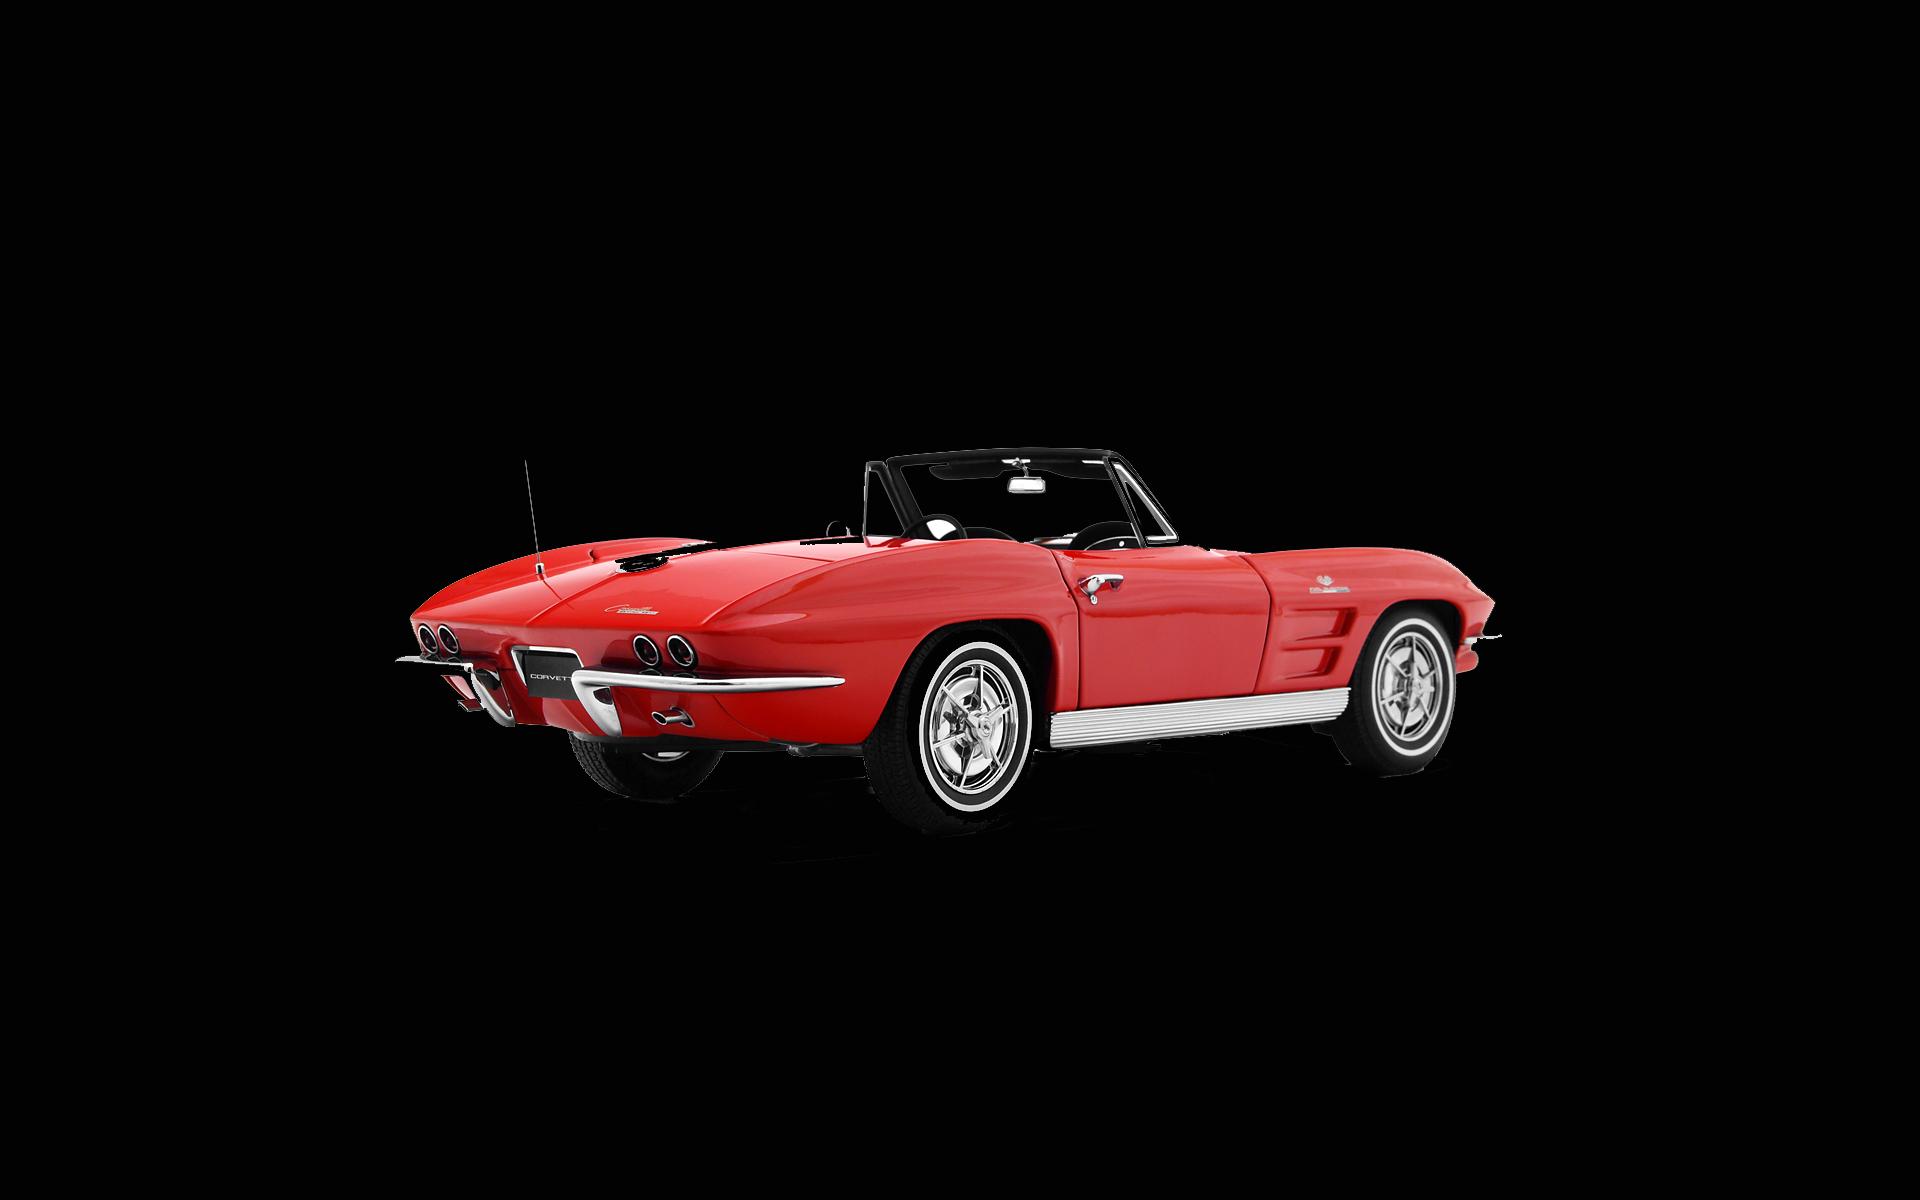 wallpaper screensaver photos car corvette ssaver wallpapersjpg 1920x1200